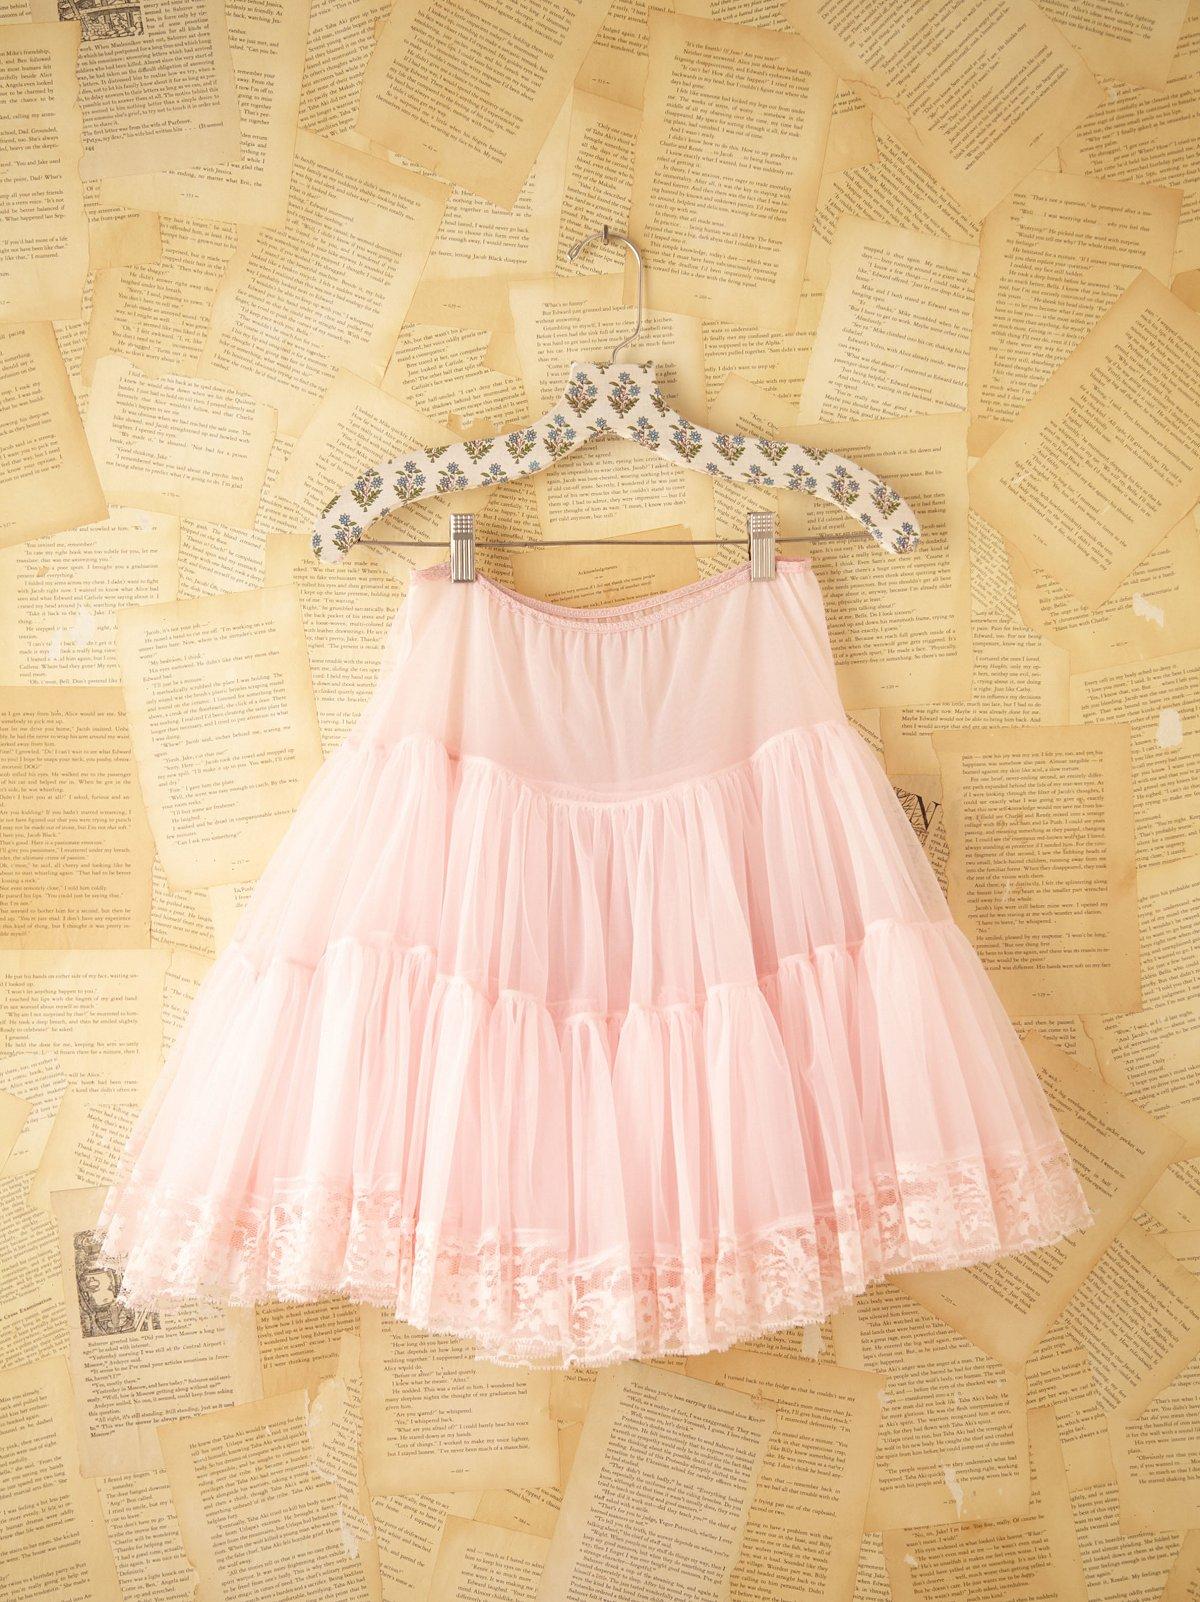 Vintage Tiered Tulle Skirt